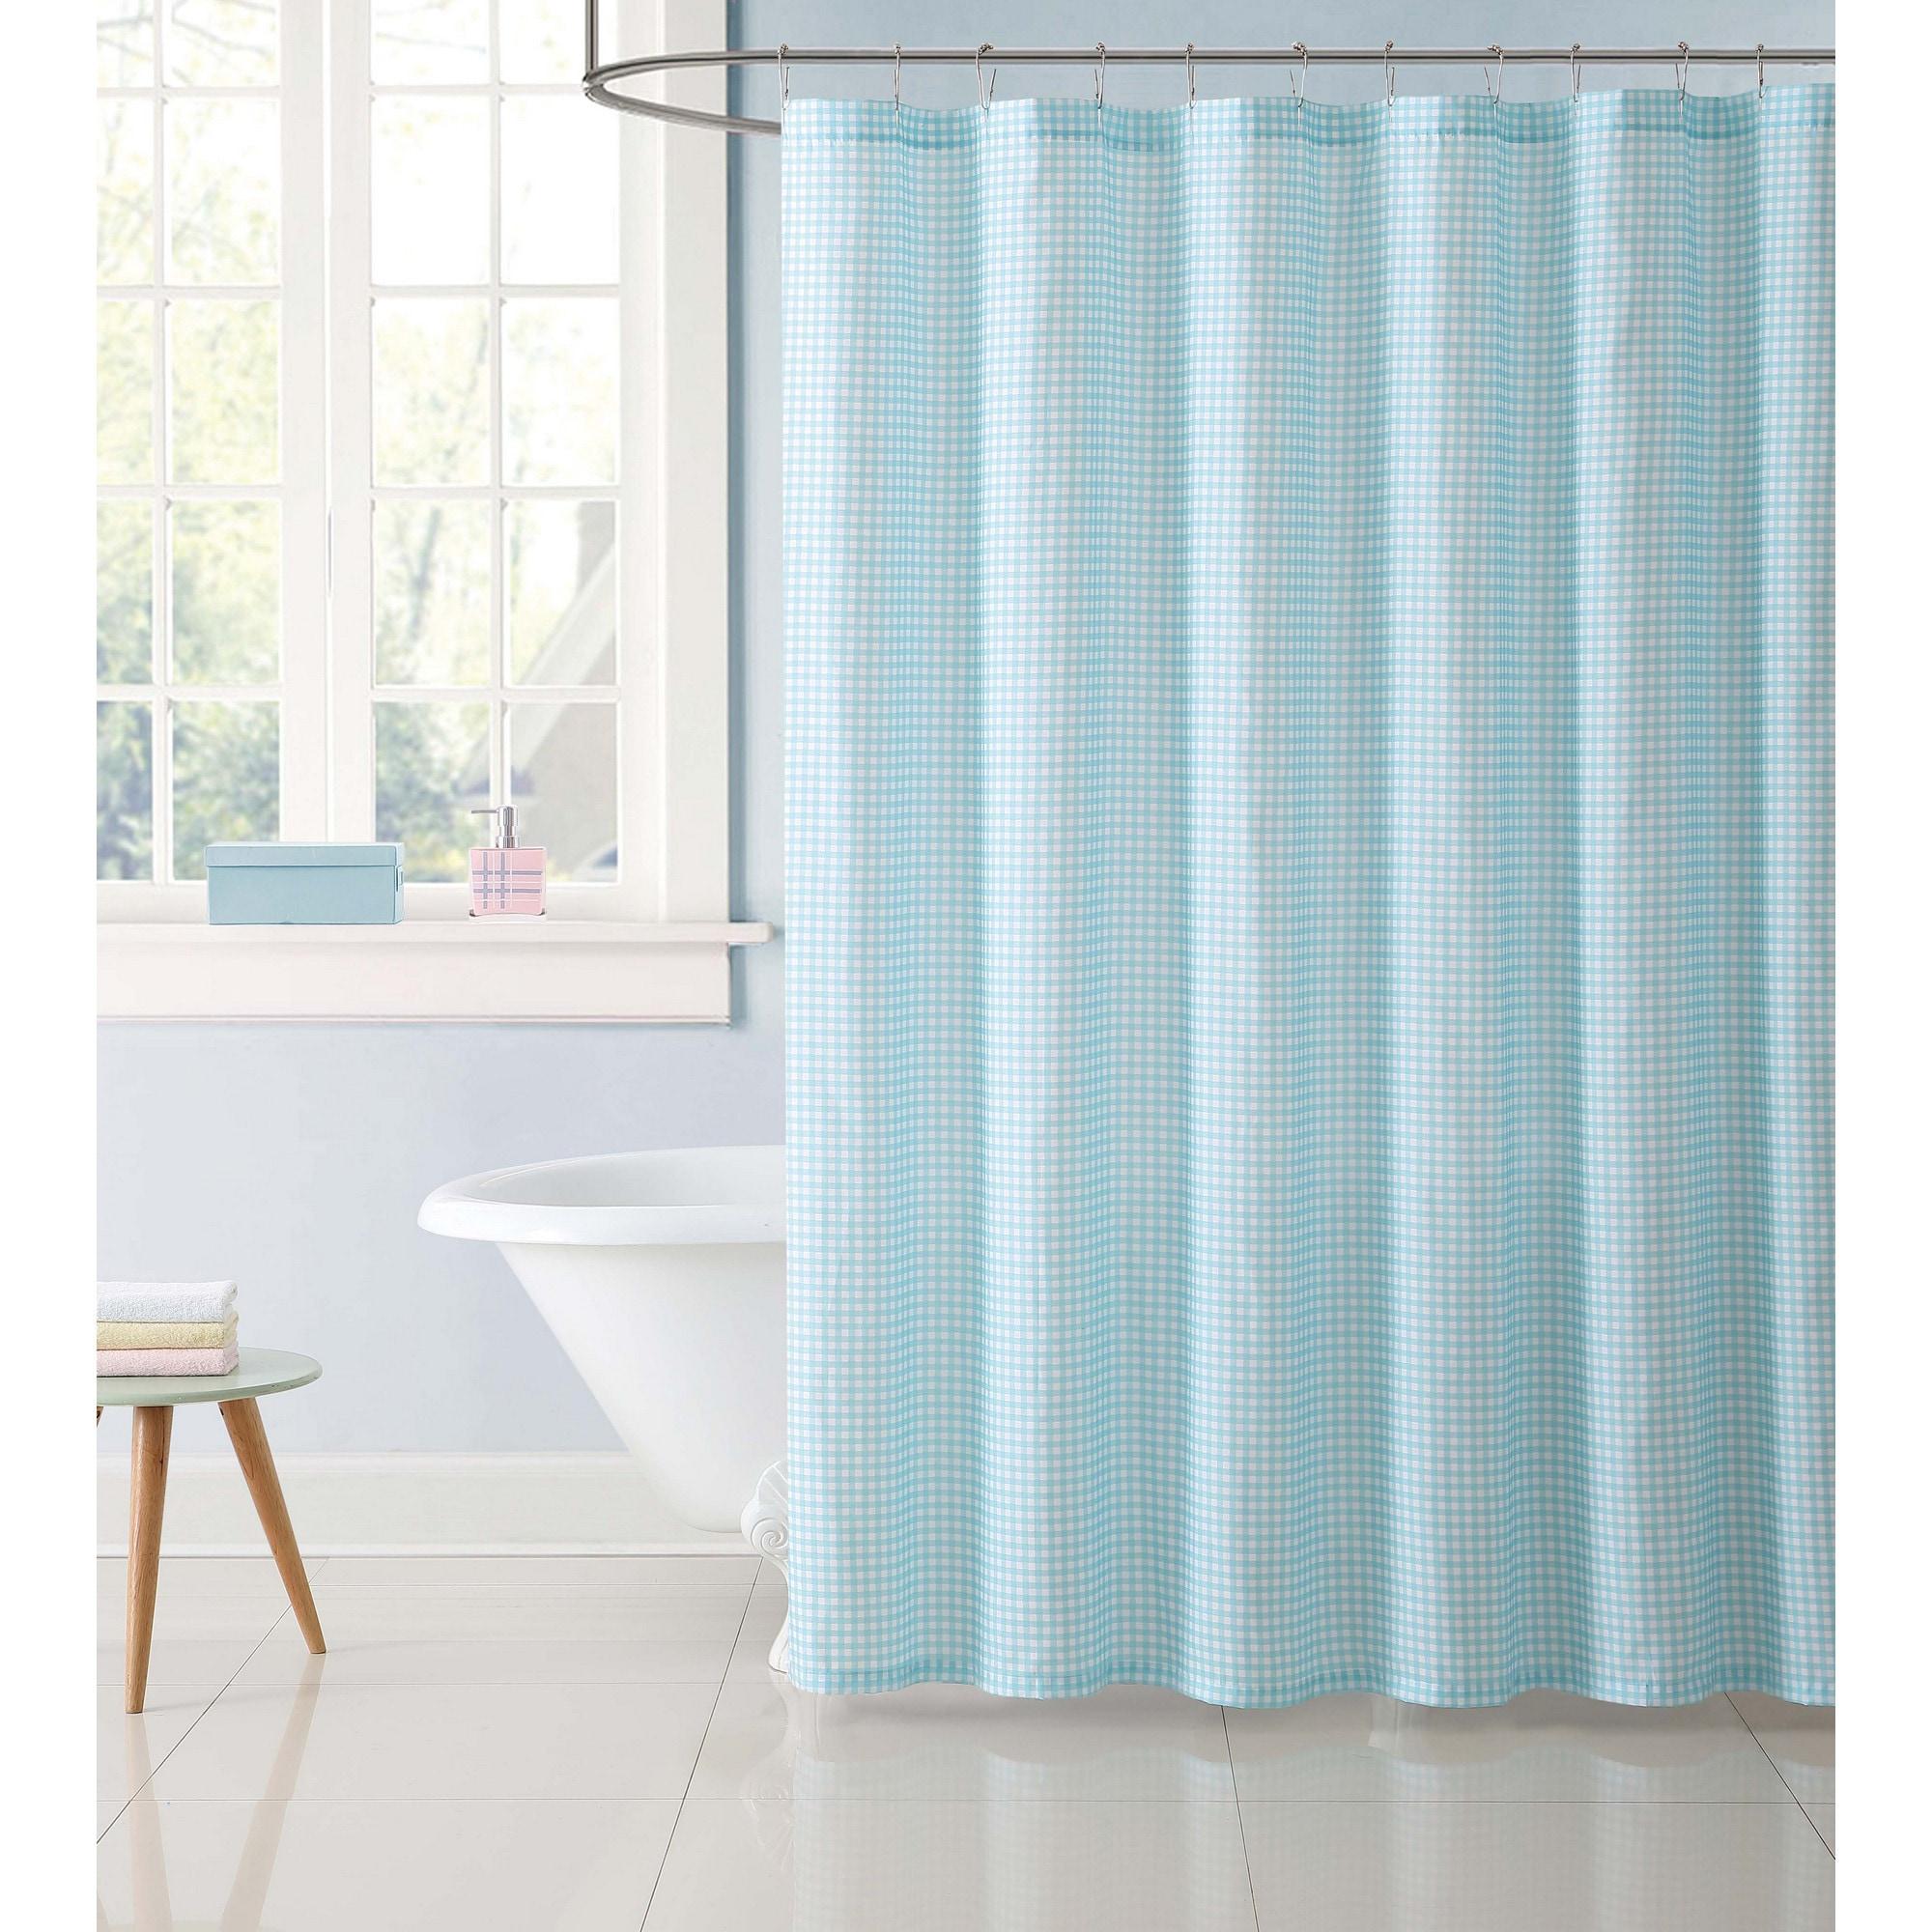 plaid curtain shower design idea curtains green of checkered minimalist